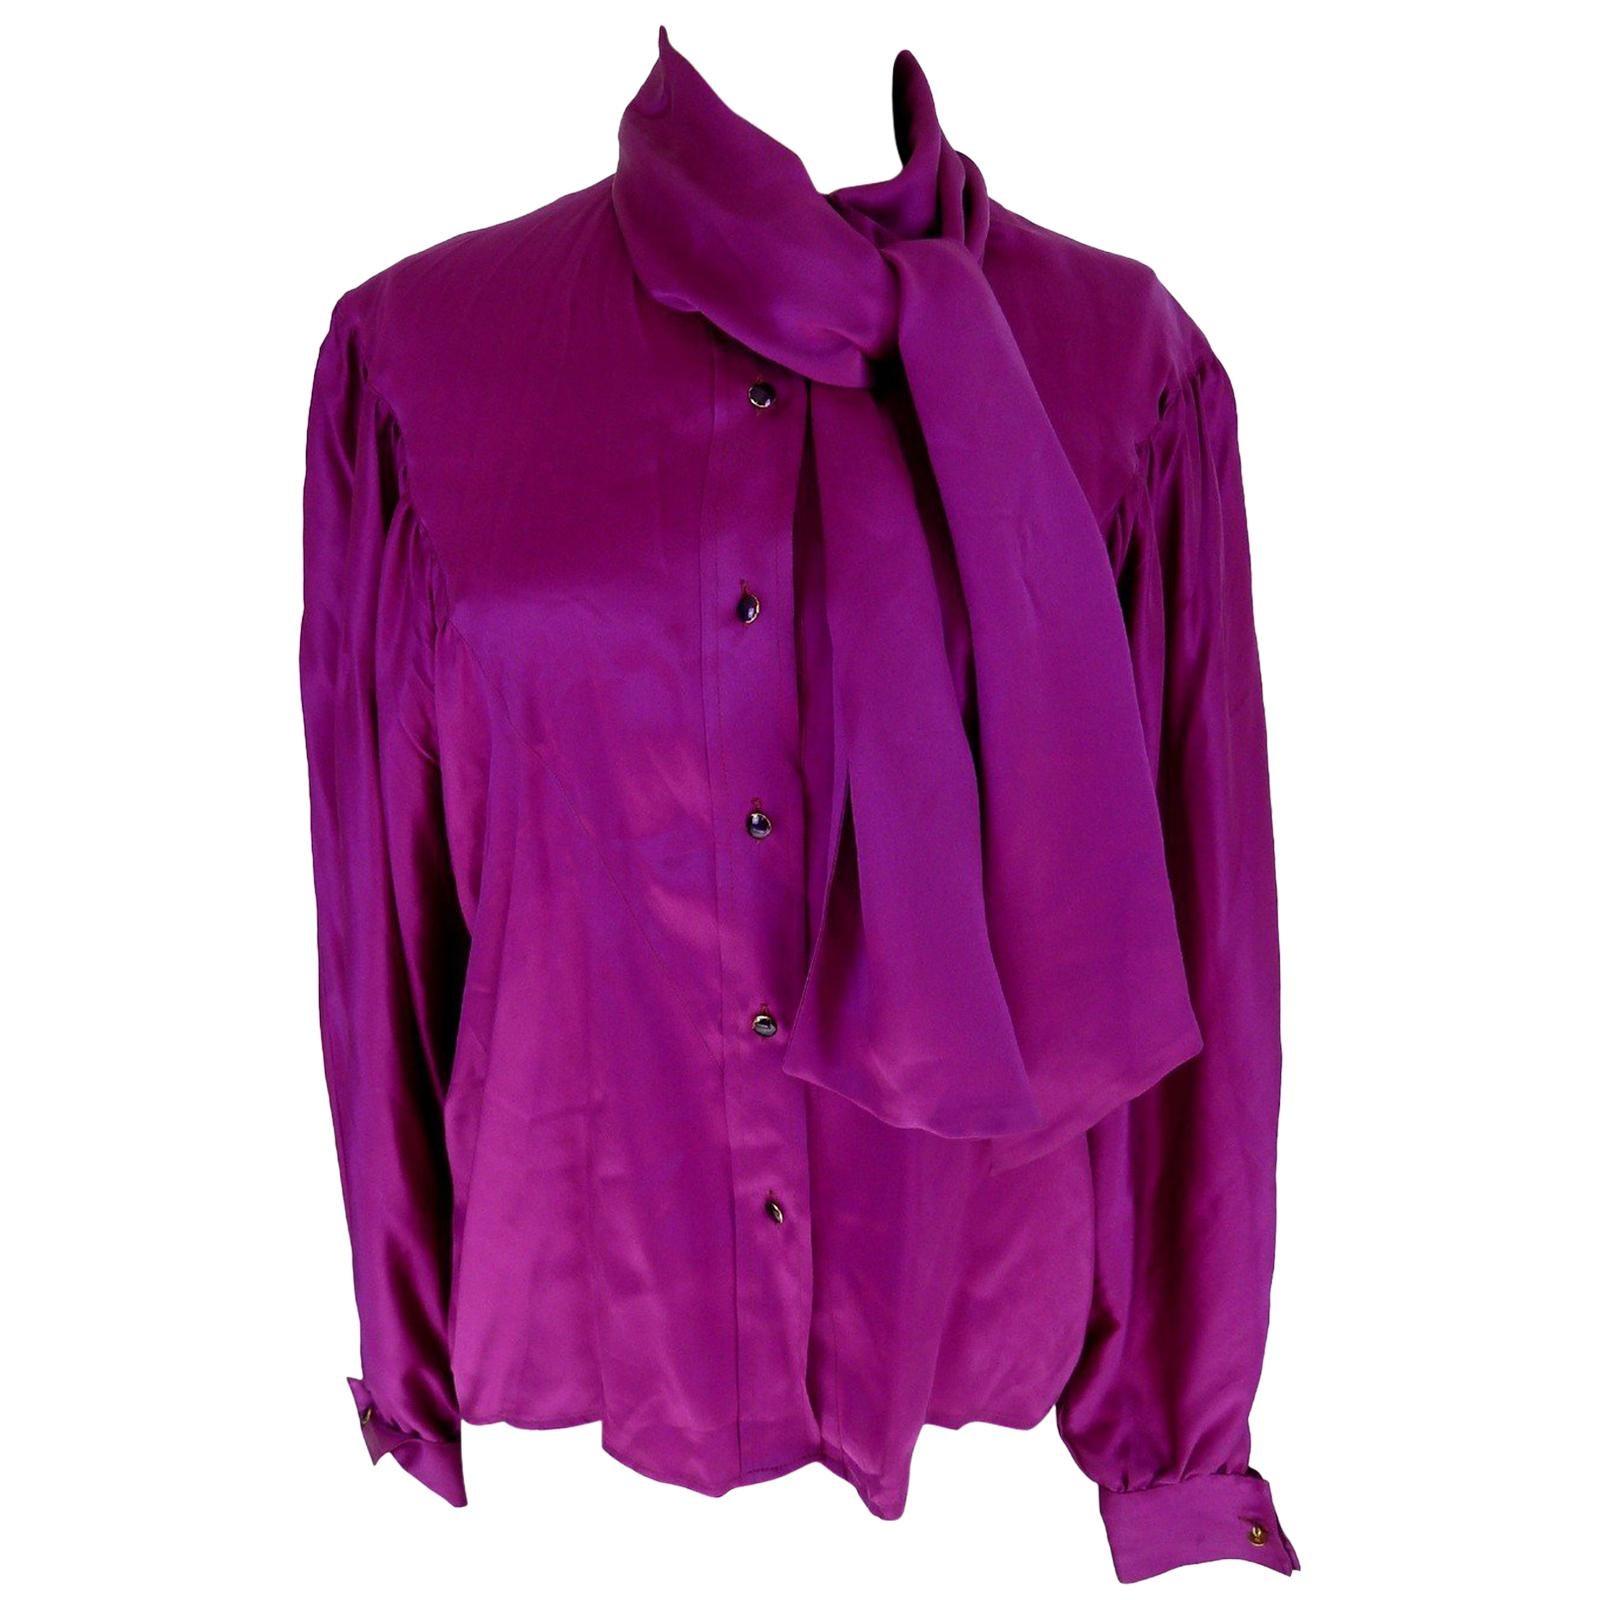 94aa64f019e7c 1980s Thierry Mugler Purple Silk Shirt at 1stdibs